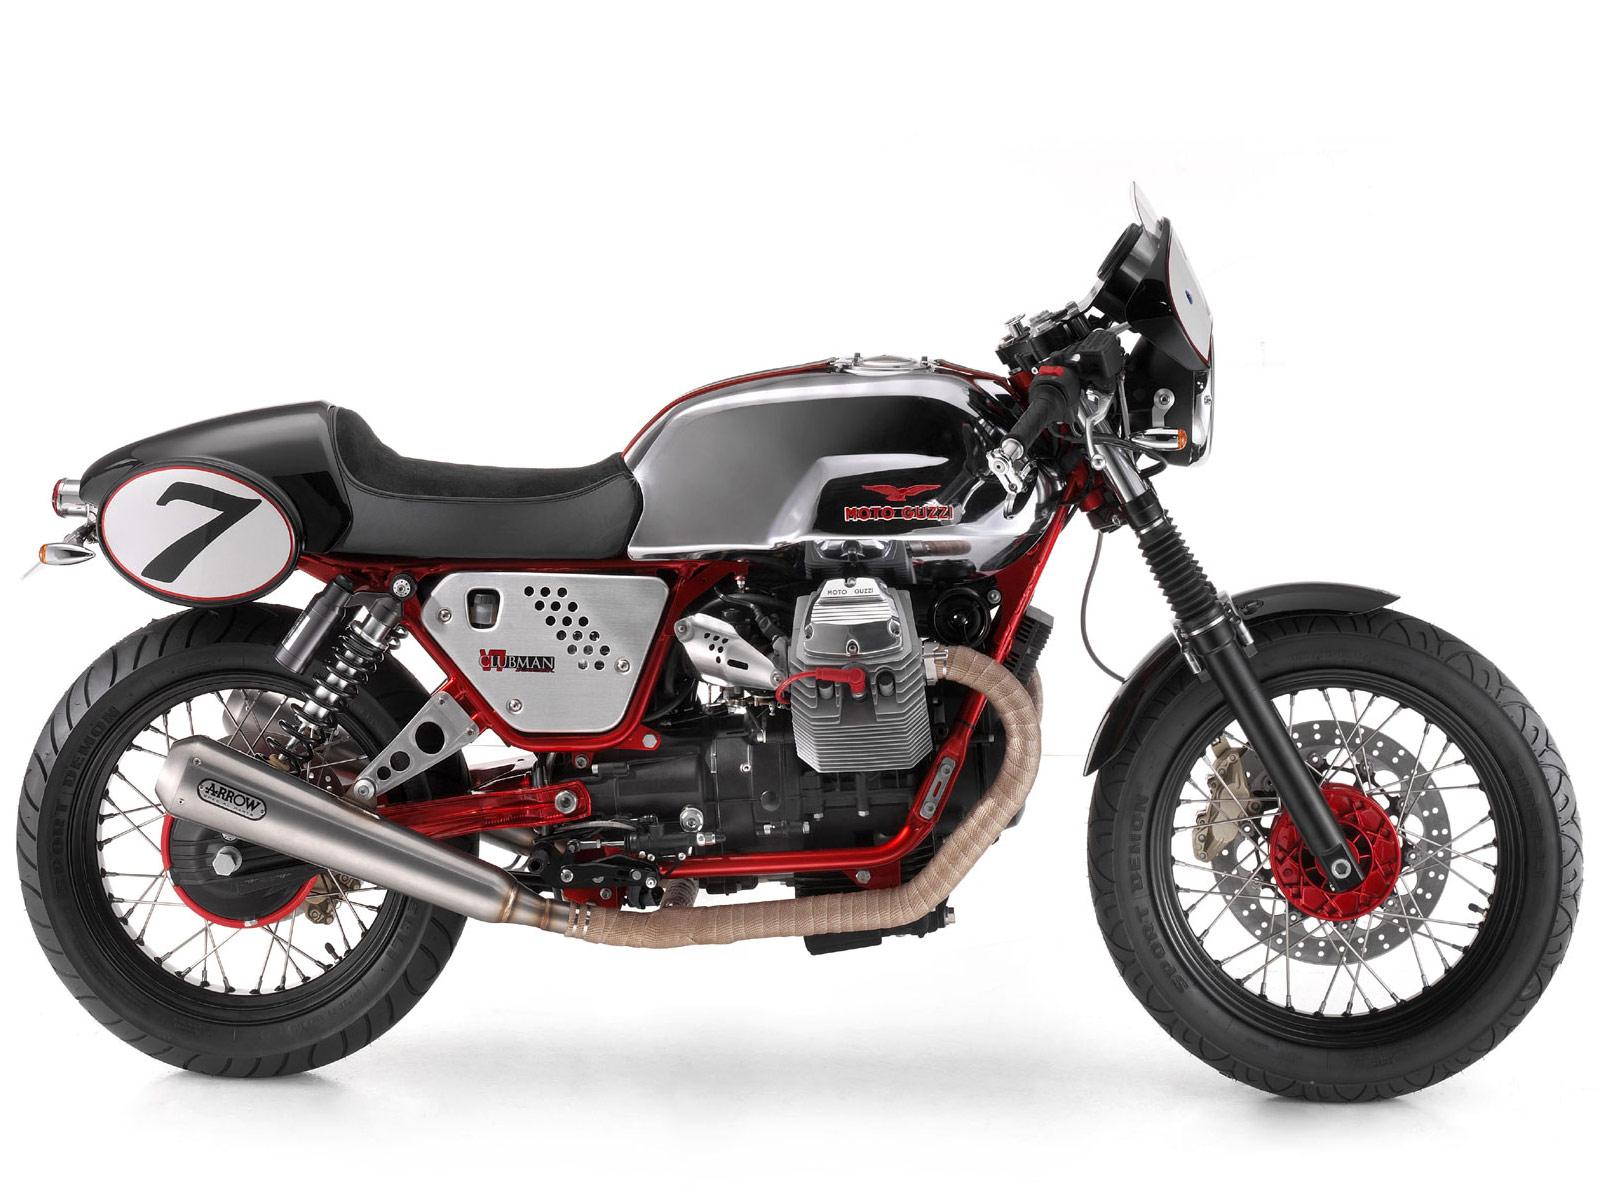 moto guzzi v7 clubman racer 2010 wallpapers. Black Bedroom Furniture Sets. Home Design Ideas